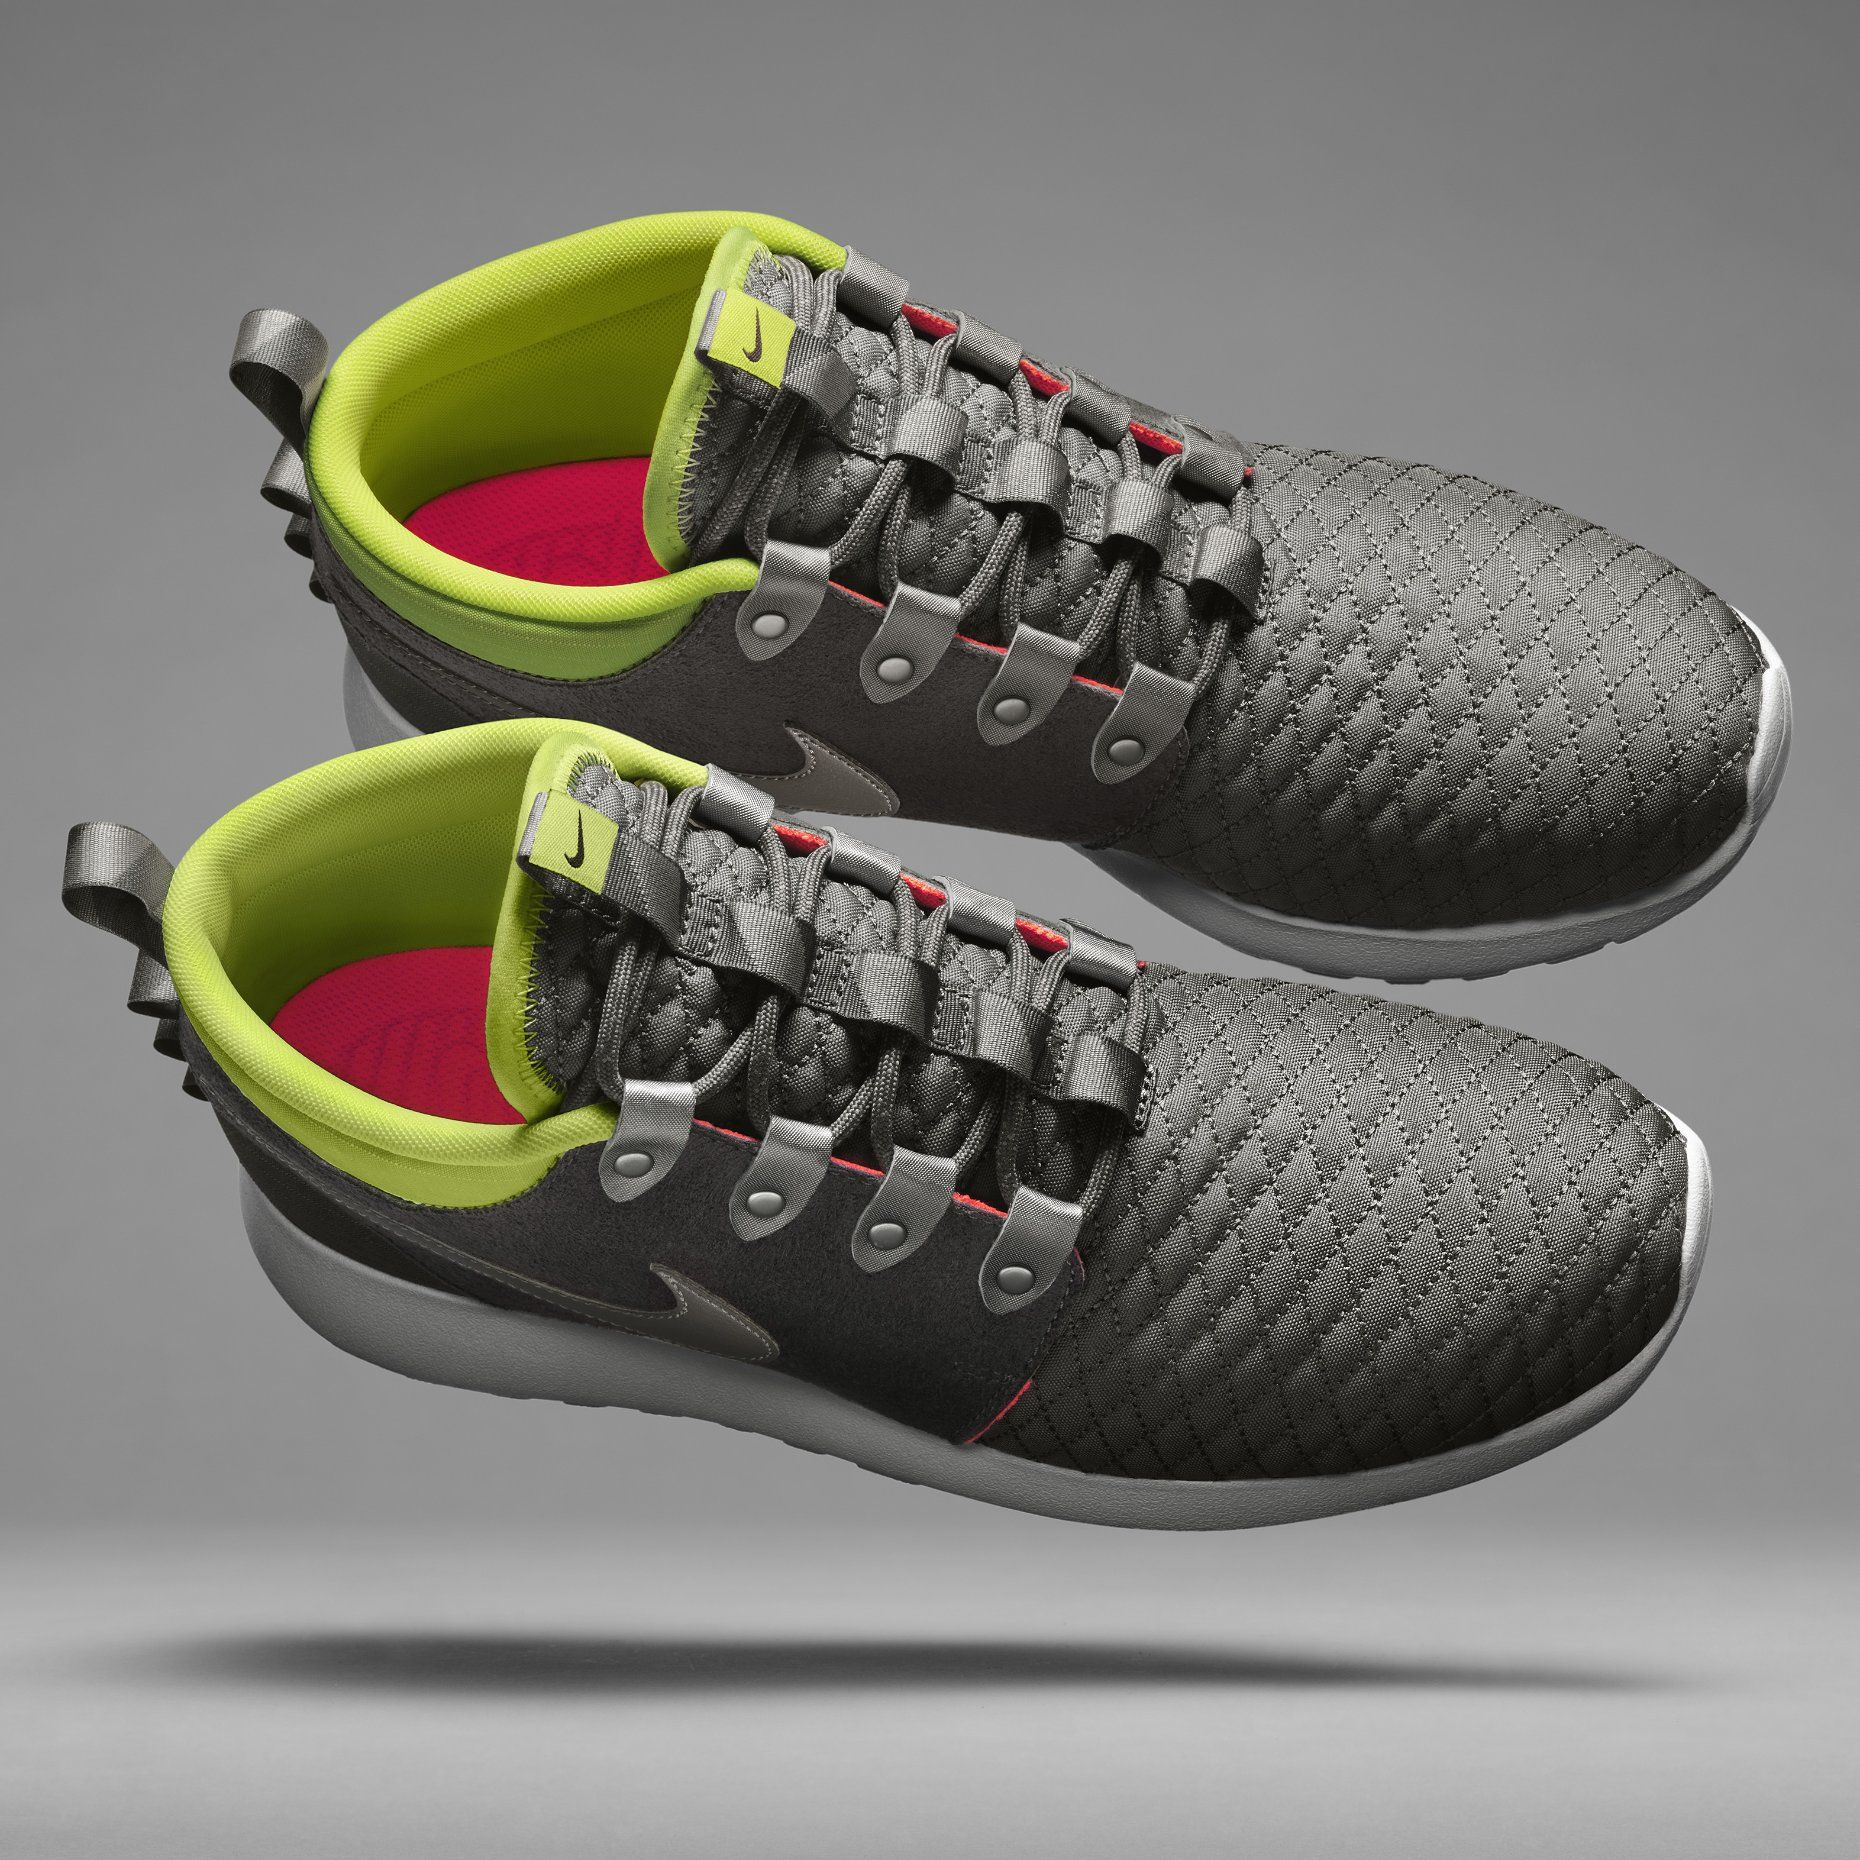 f5a80b613481 Nike Store. Nike Roshe Run SneakerBoot Men s Shoe